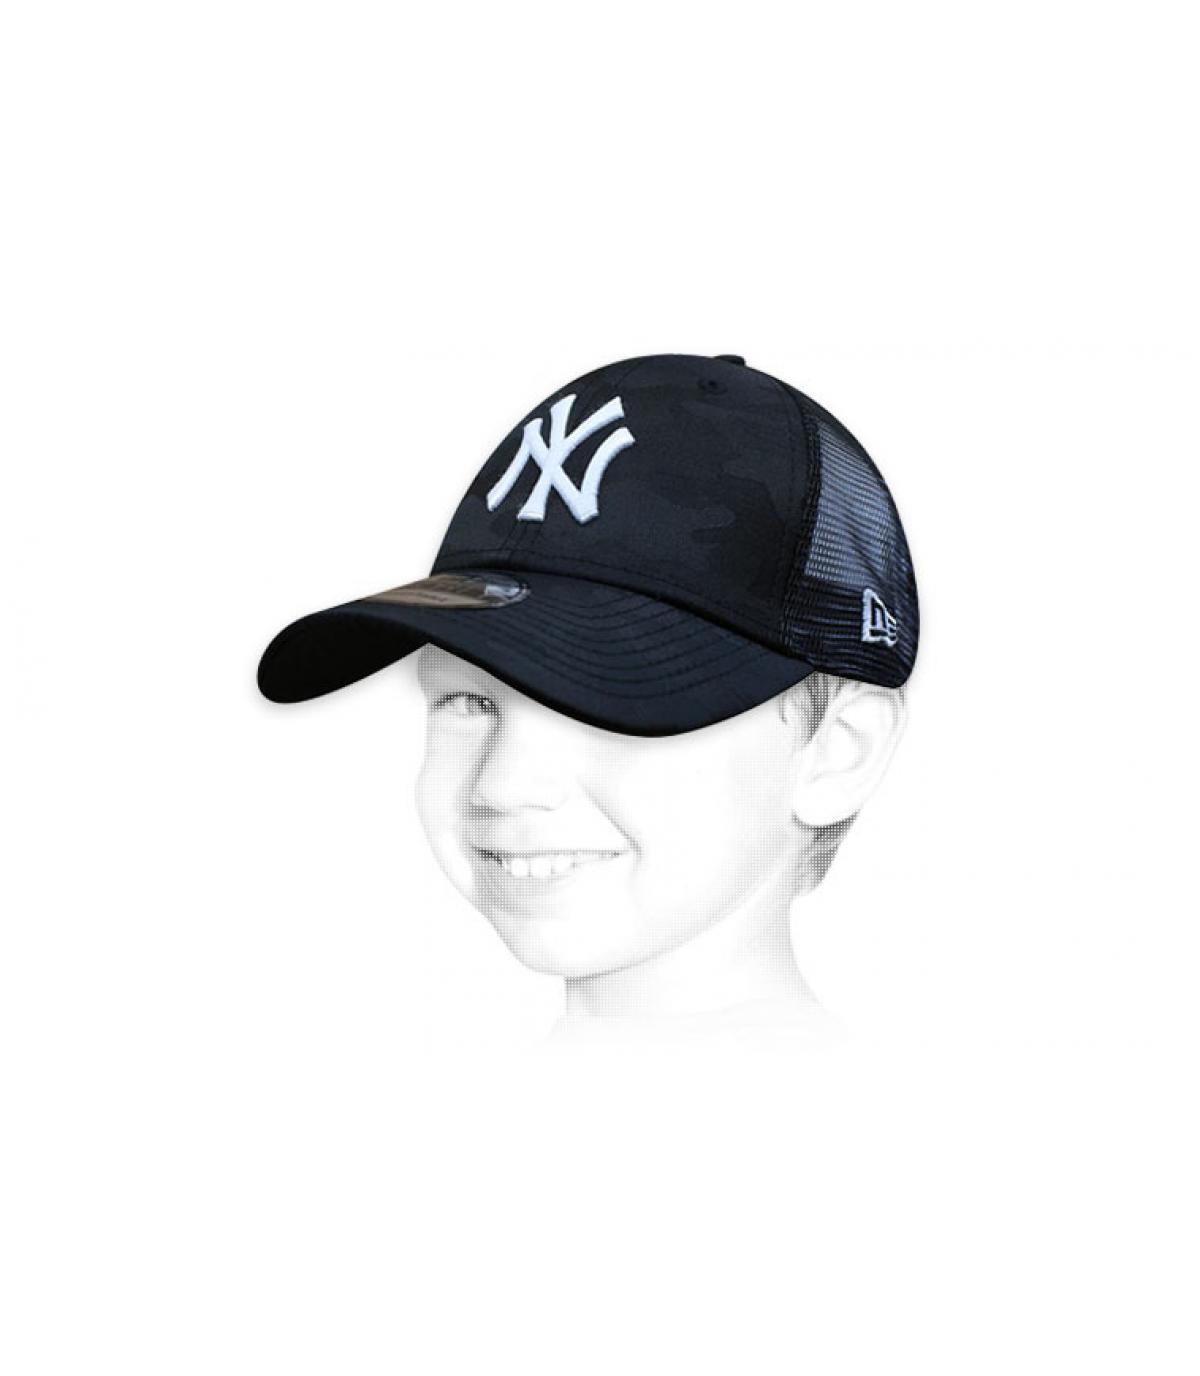 NY zwarte kinder trucker